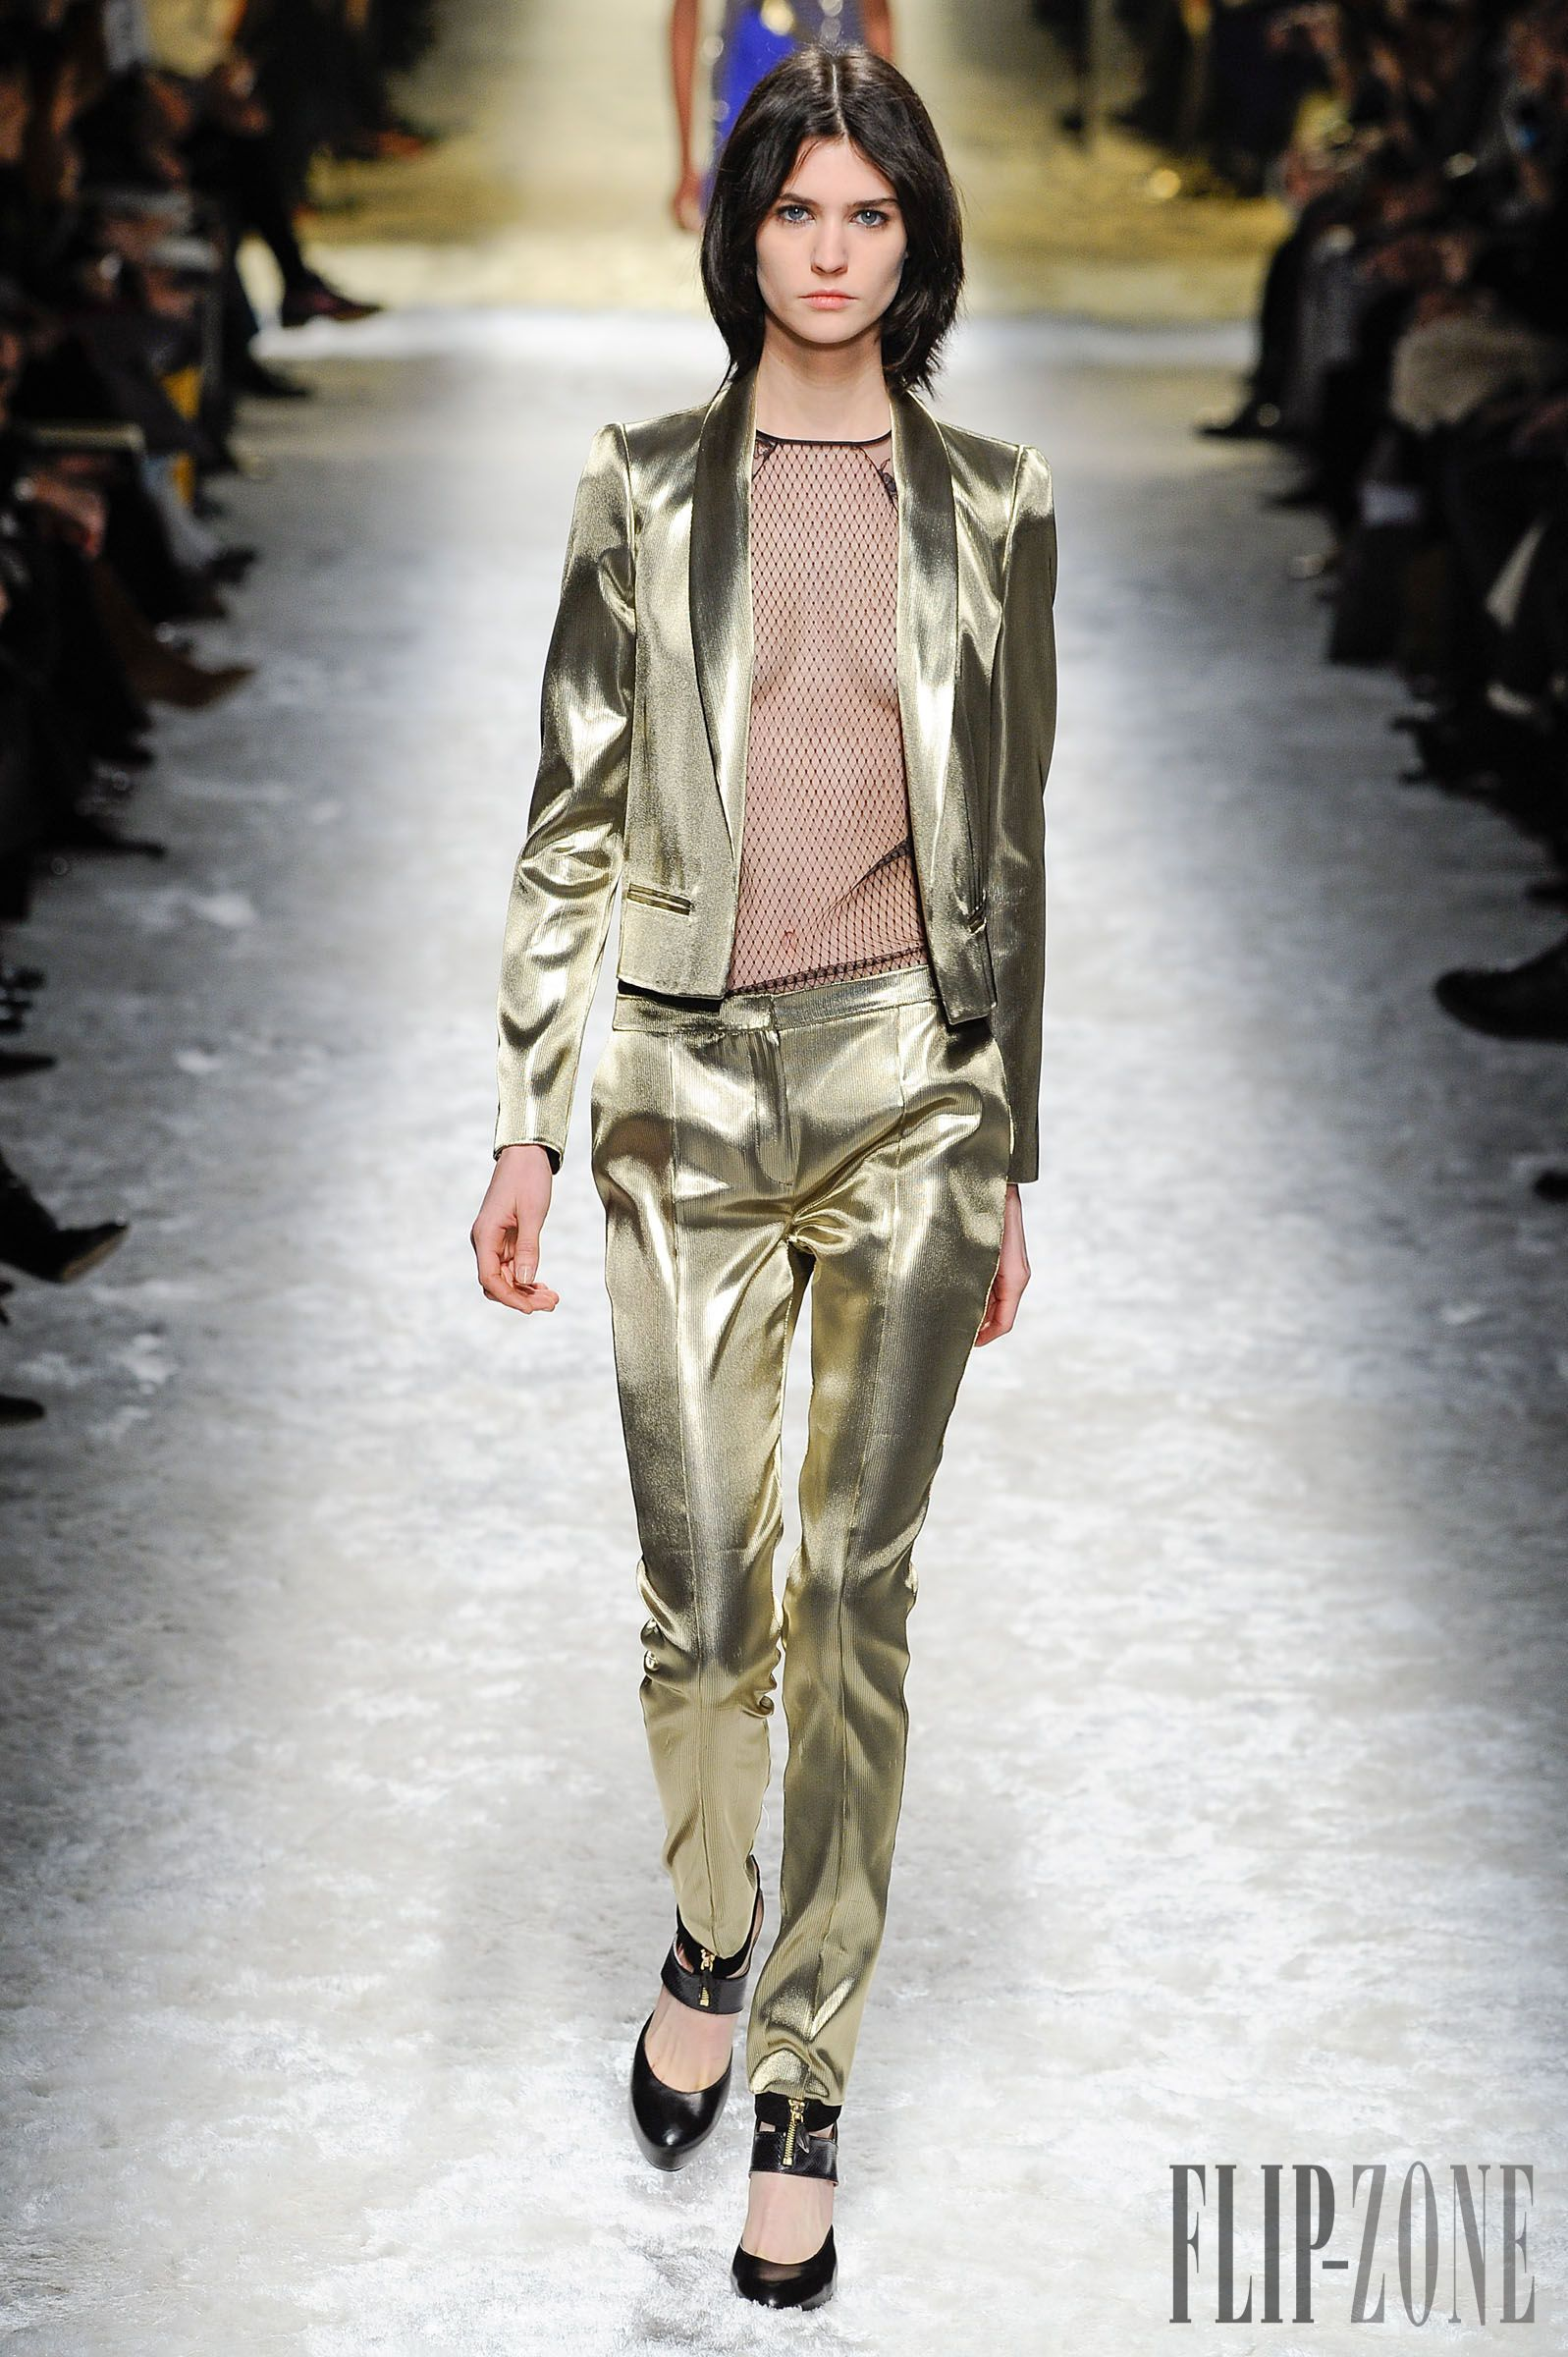 Blumarine Sonbahar-Kış 2014-2015 - Hazır giyim - http://tr.flip-zone.com/fashion/ready-to-wear/fashion-houses-42/blumarine-4579 - ©PixelFormula